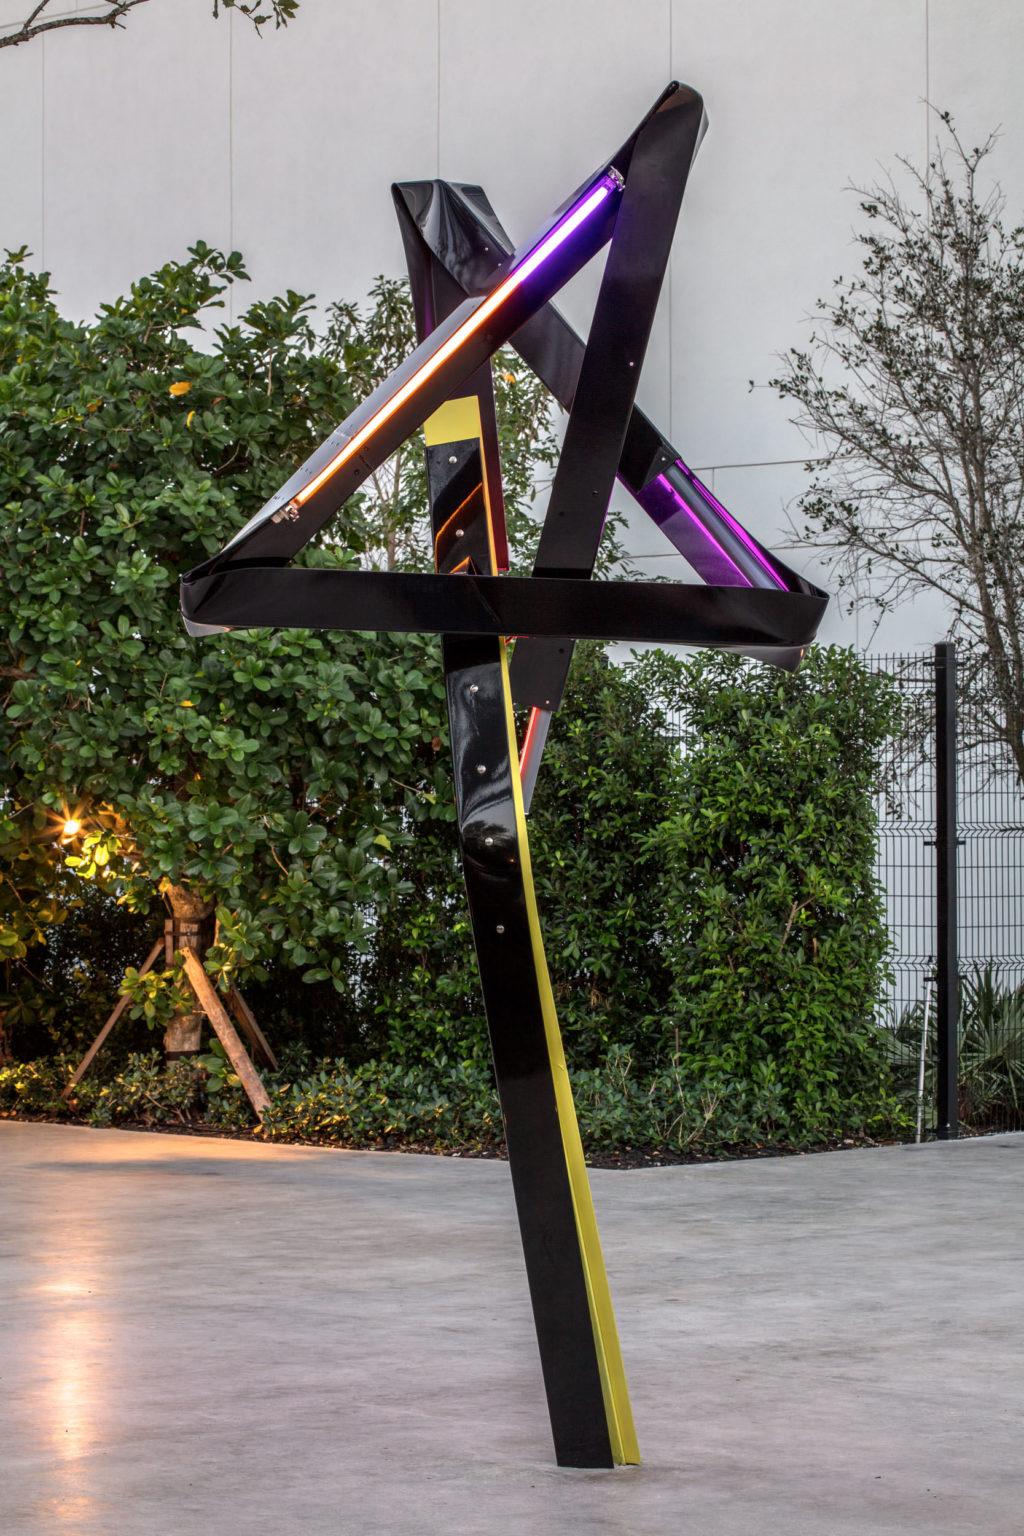 Installation view Mark Handforth, Dr. Pepper, 2017 at ICA Miami.